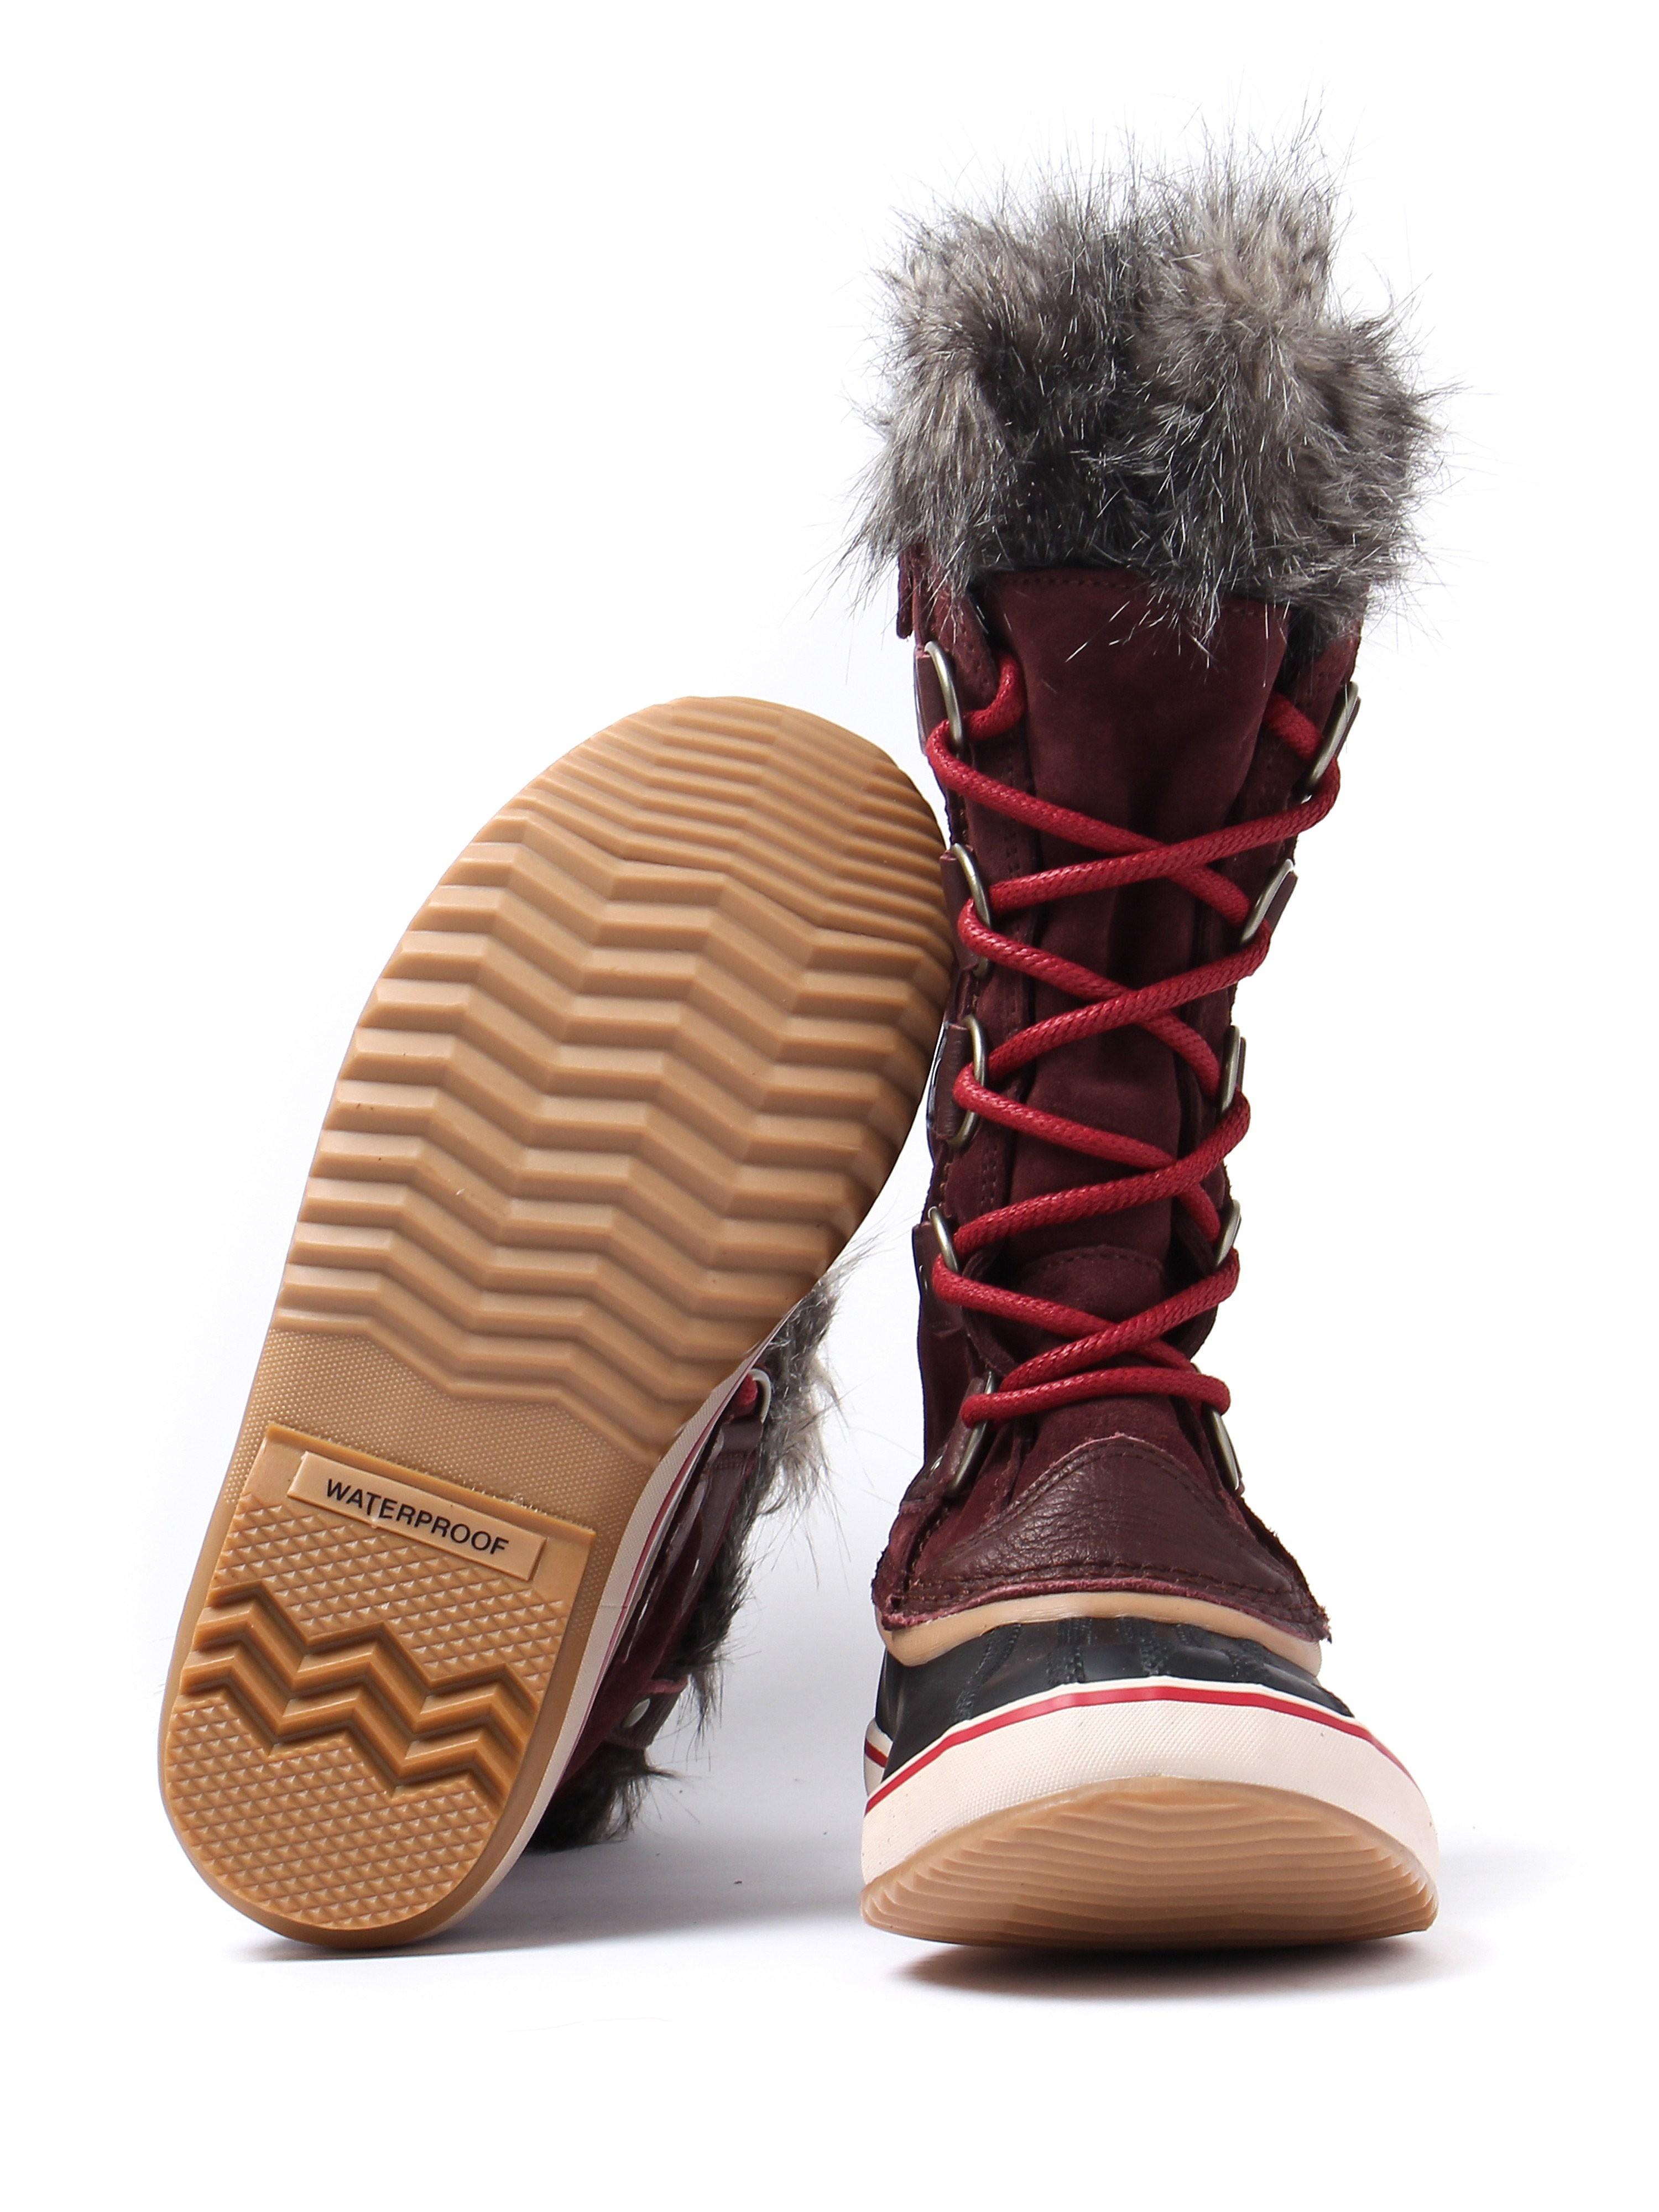 Sorel Women's Joan of Arctic Boots - Redwood Leather